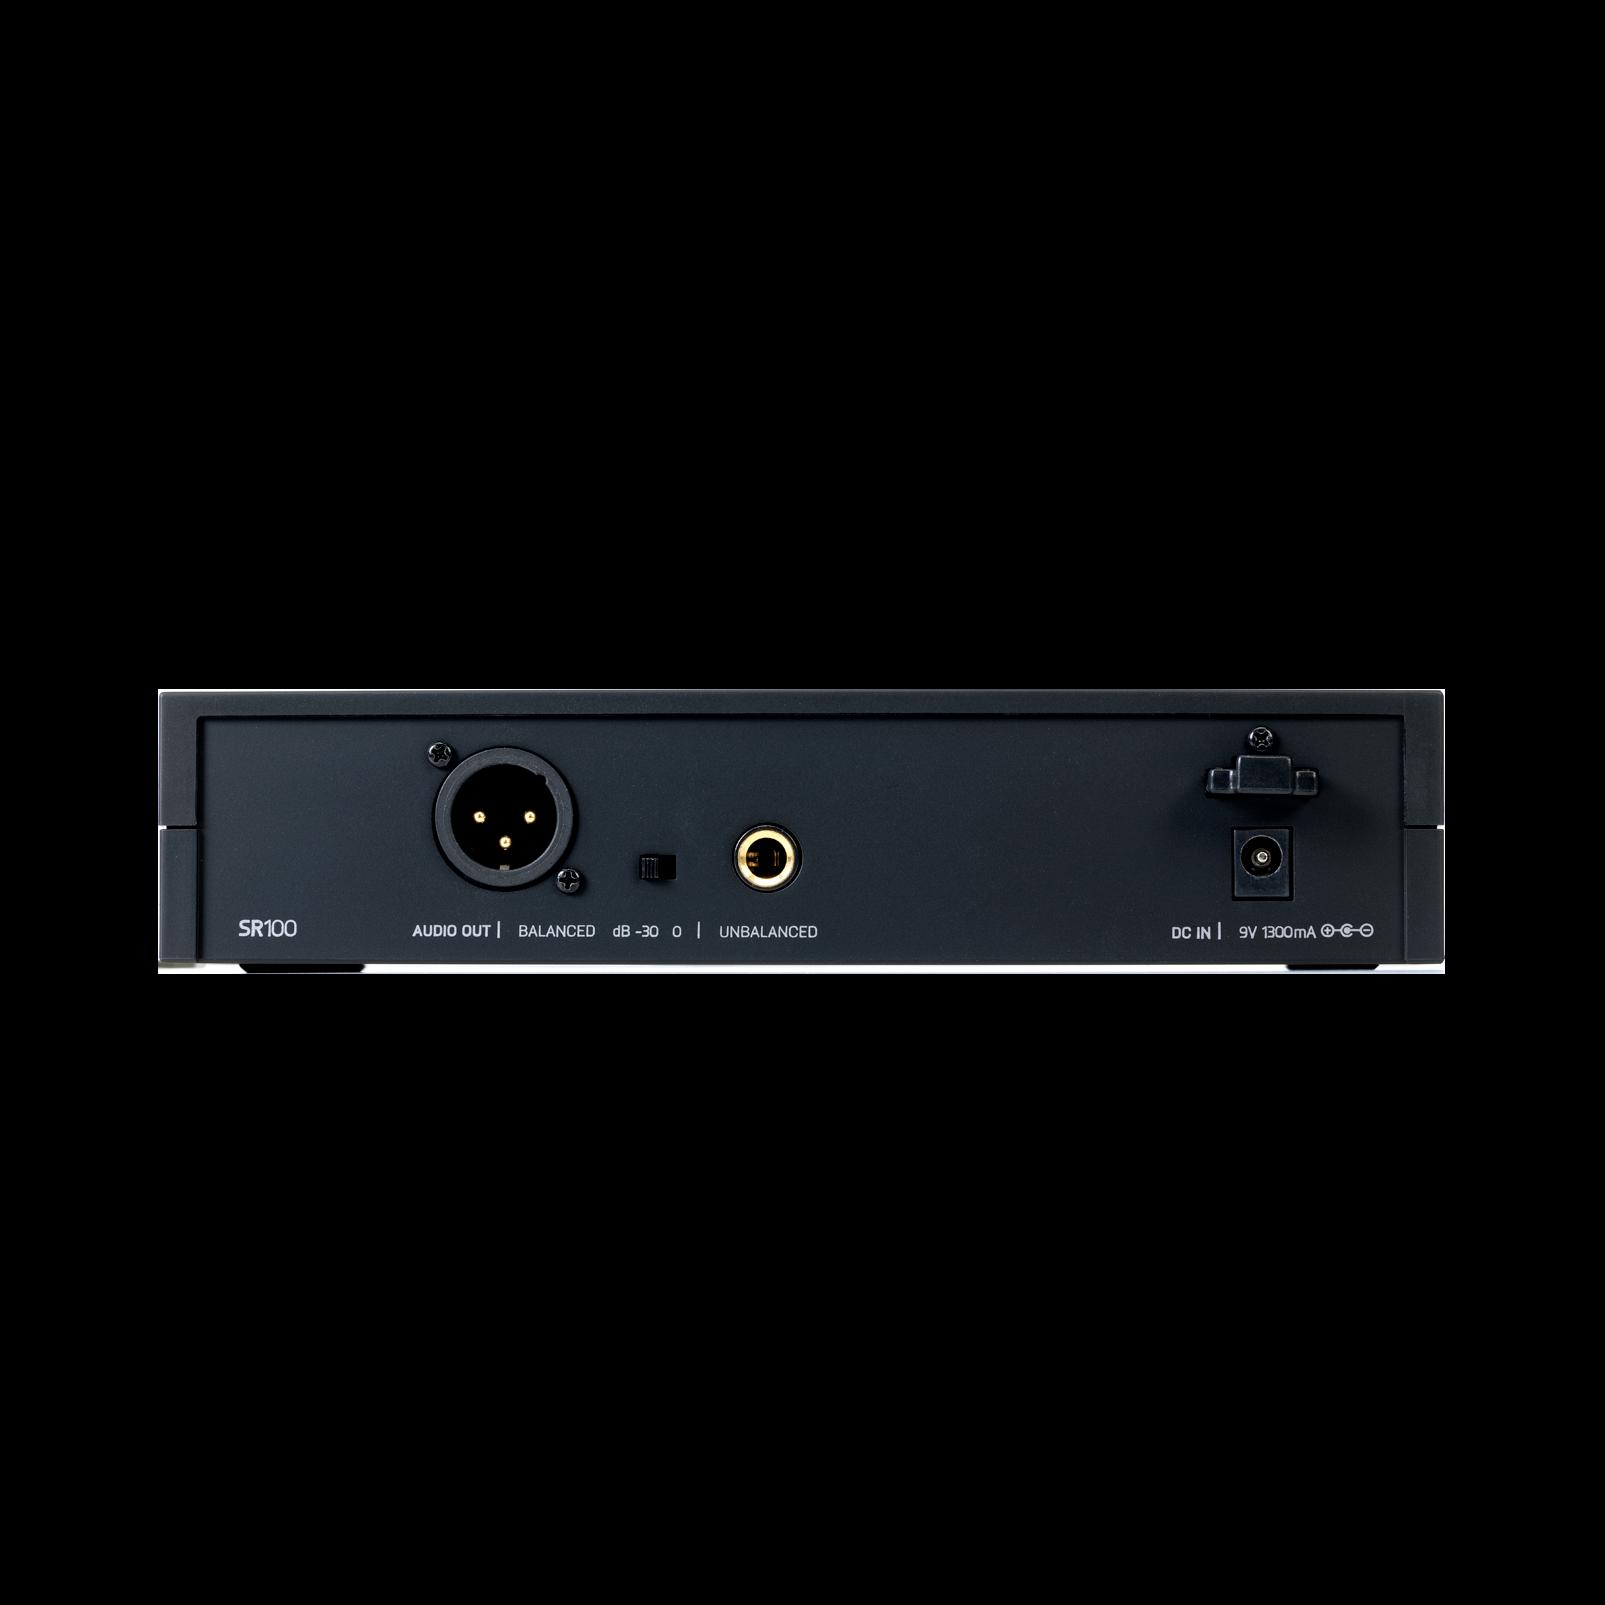 DMS100 Microphone Set - Black - Digital wireless microphone system - Back